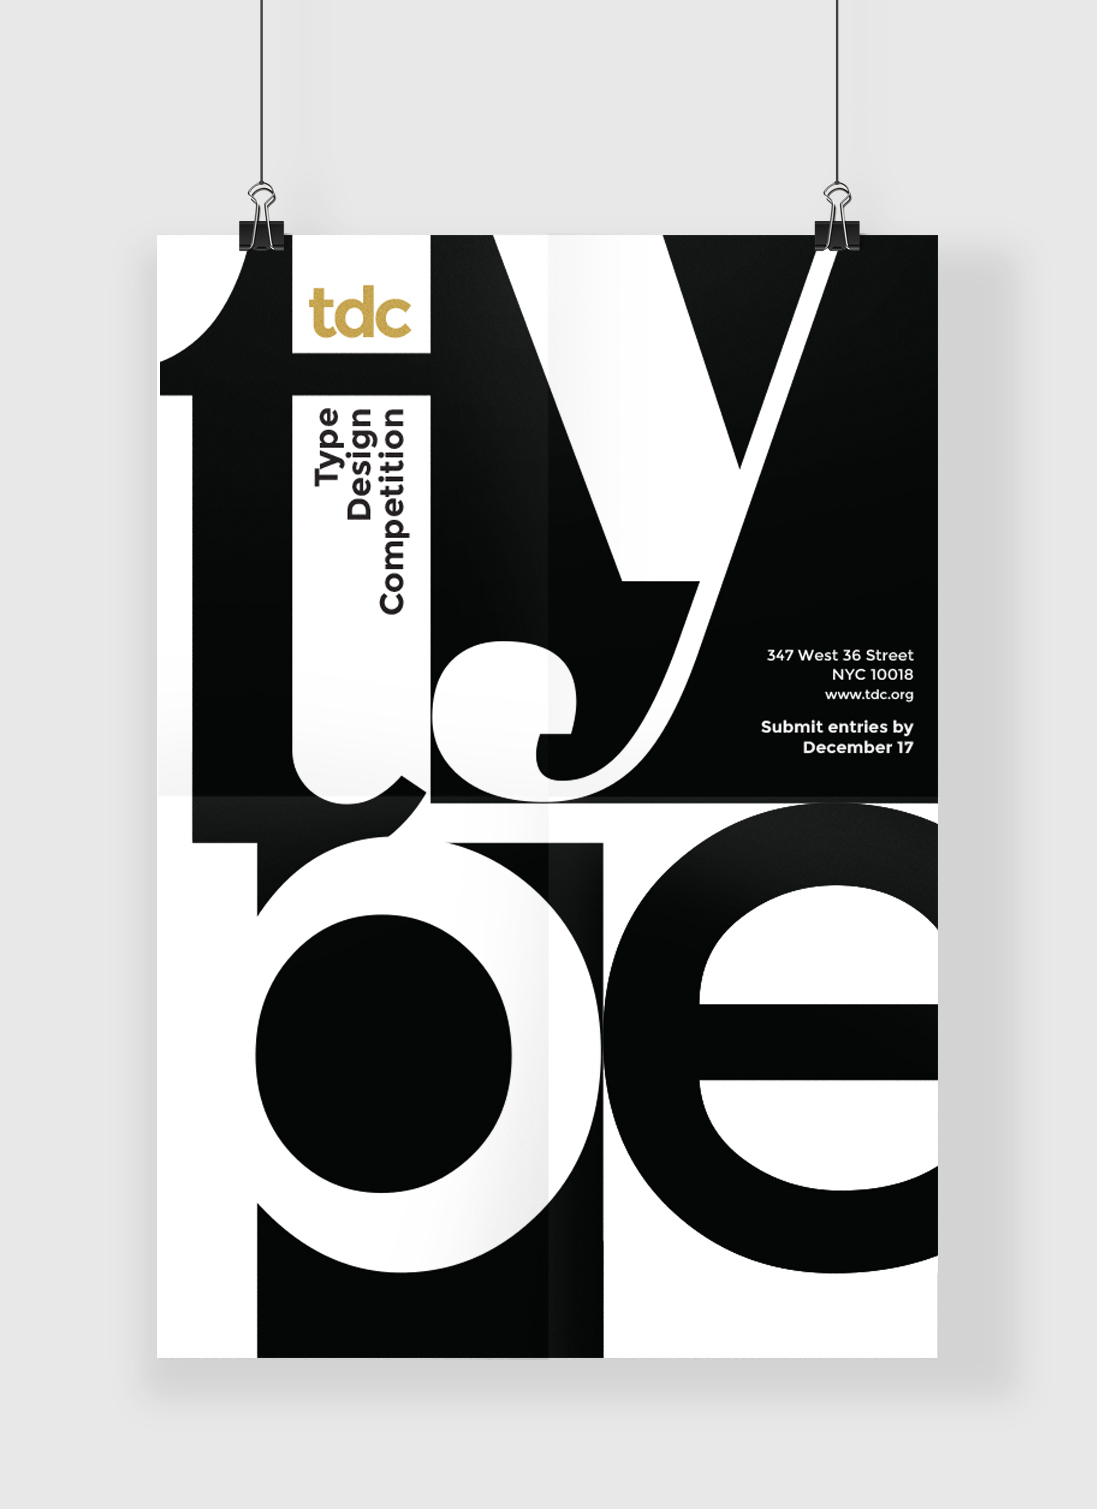 poster banner type aesthetics Functional Design